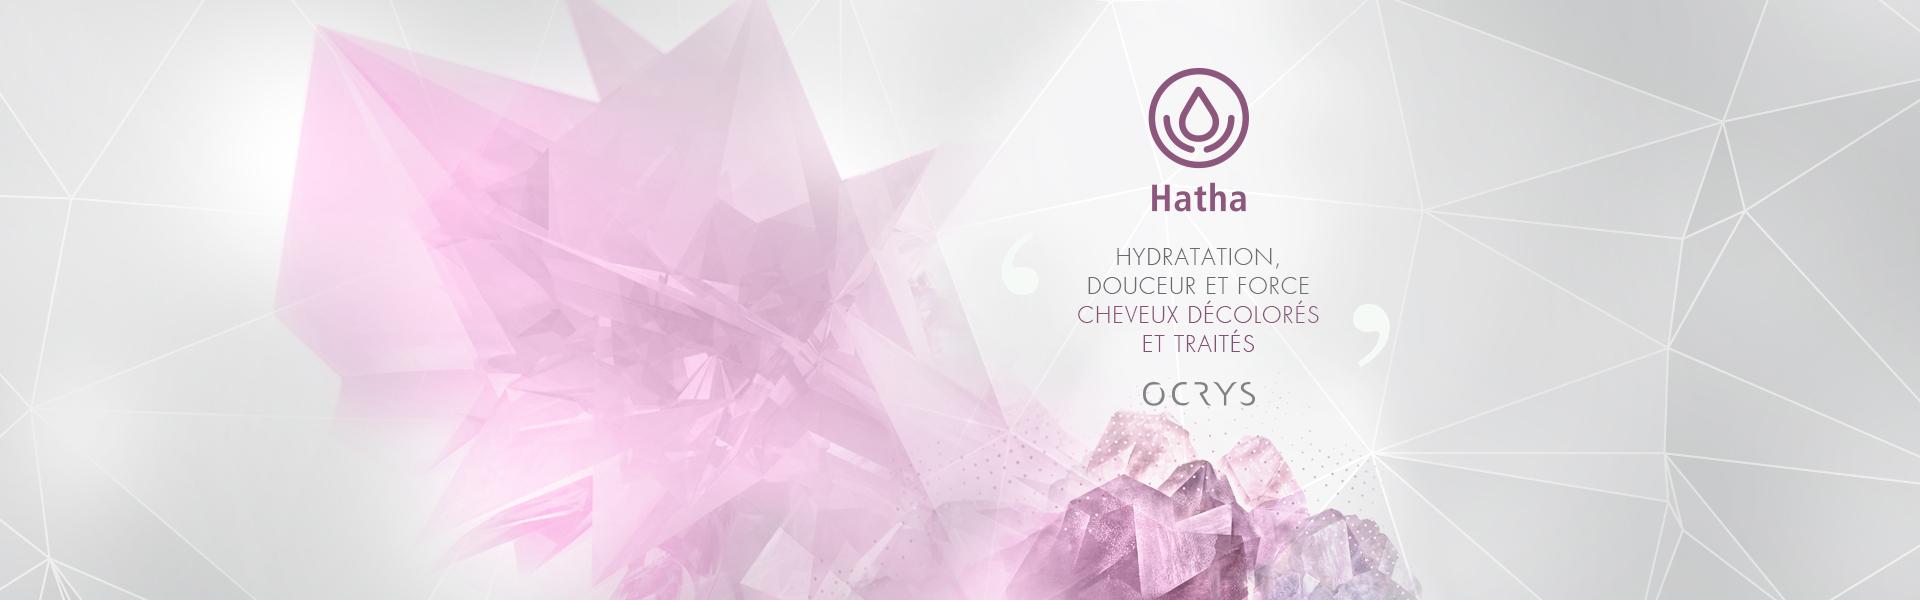 banner_centrali_HATHA_FR